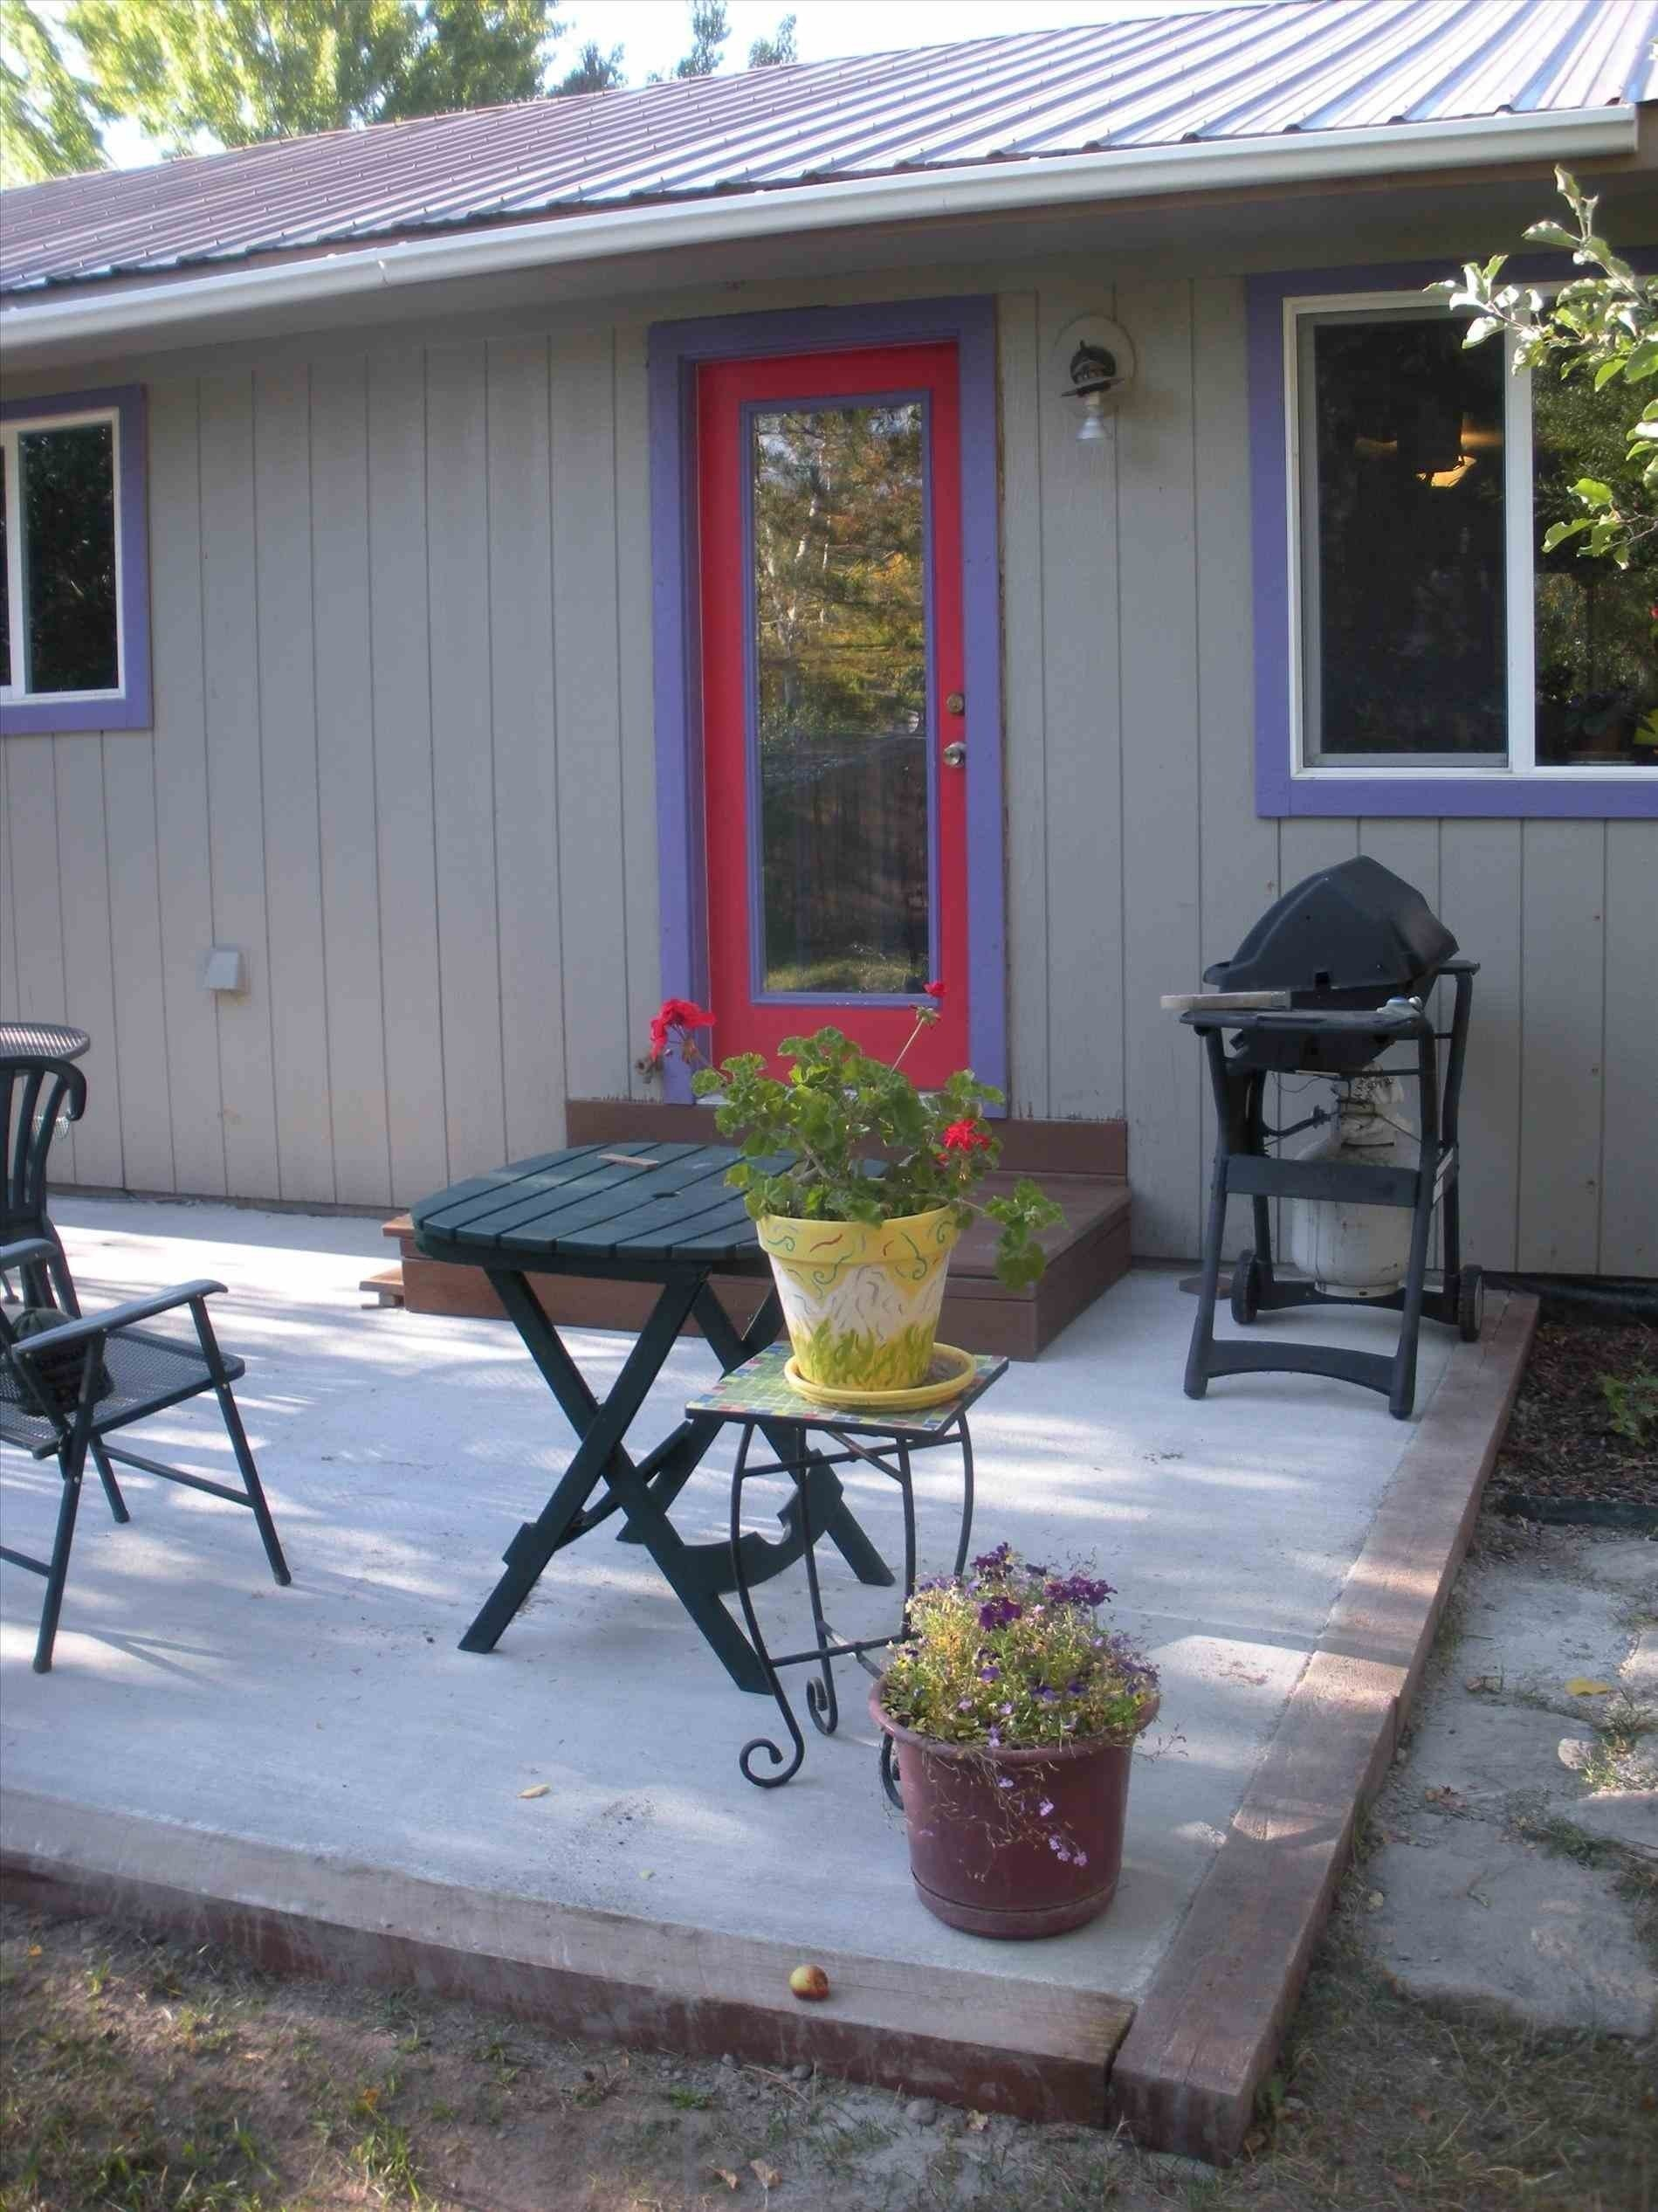 10 Best Concrete Patio Ideas For Small Backyards small cement patio ideas fresh concrete small cement patio ideas